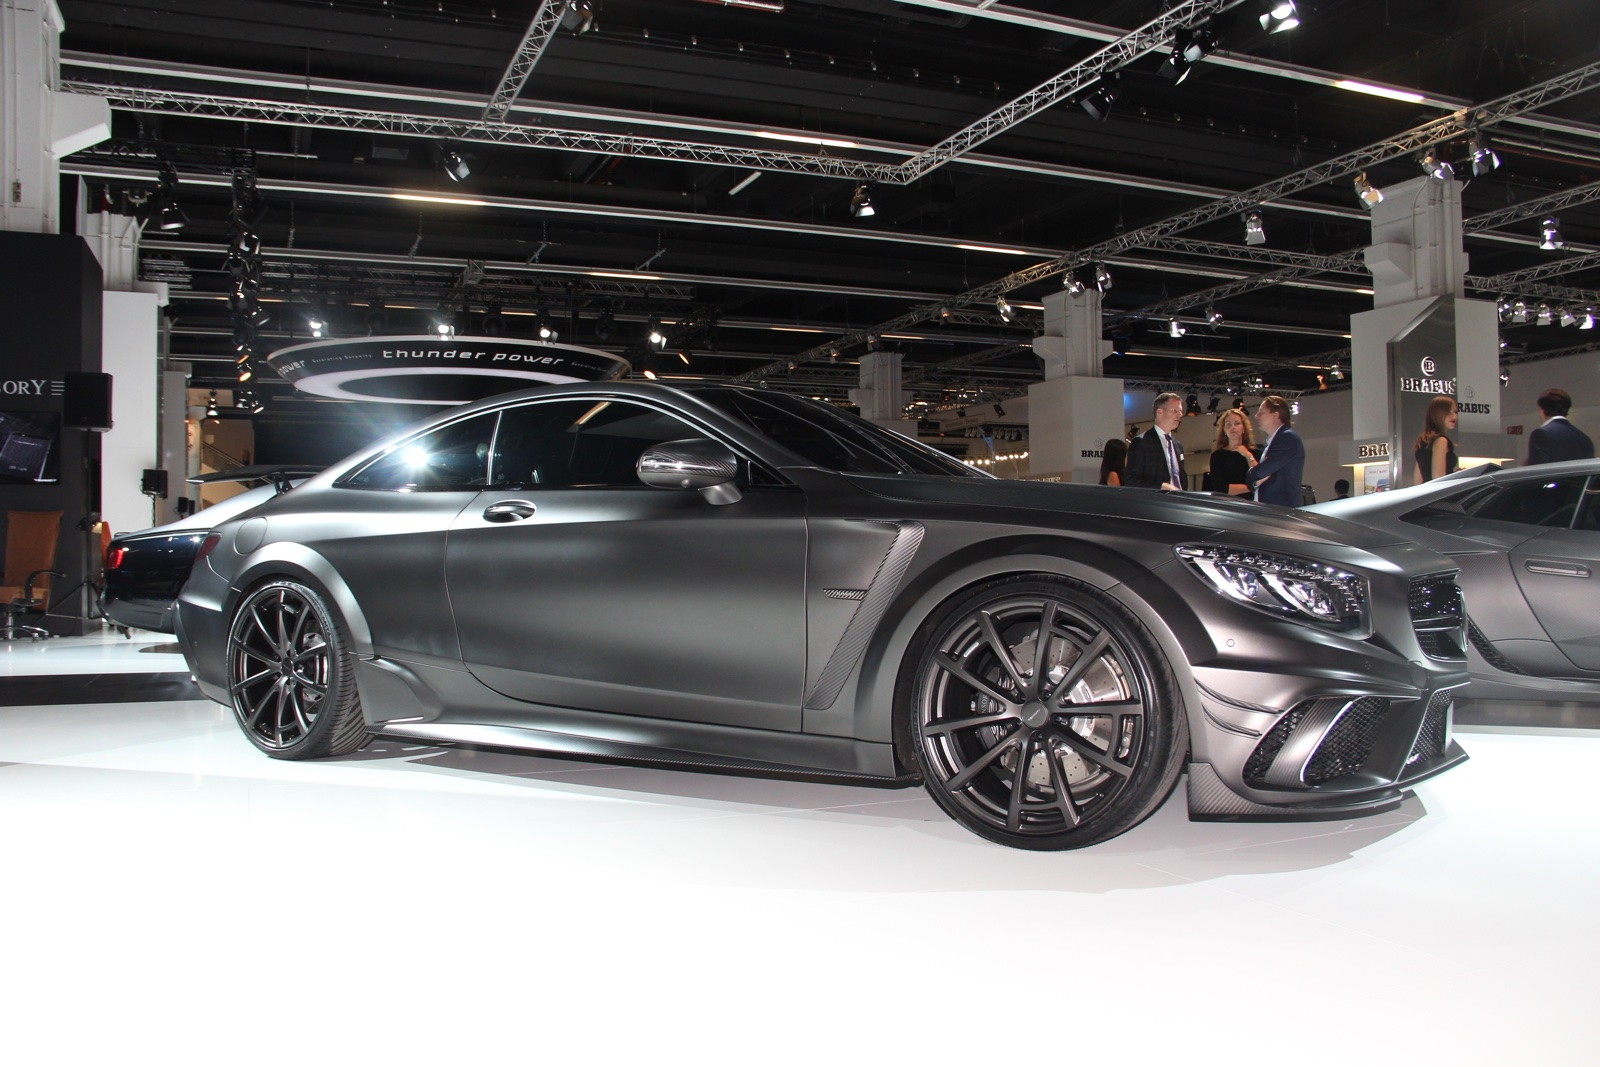 Frankfurt 2015 mansory mercedes benz s63 amg coupe black for Mercedes benz black edition